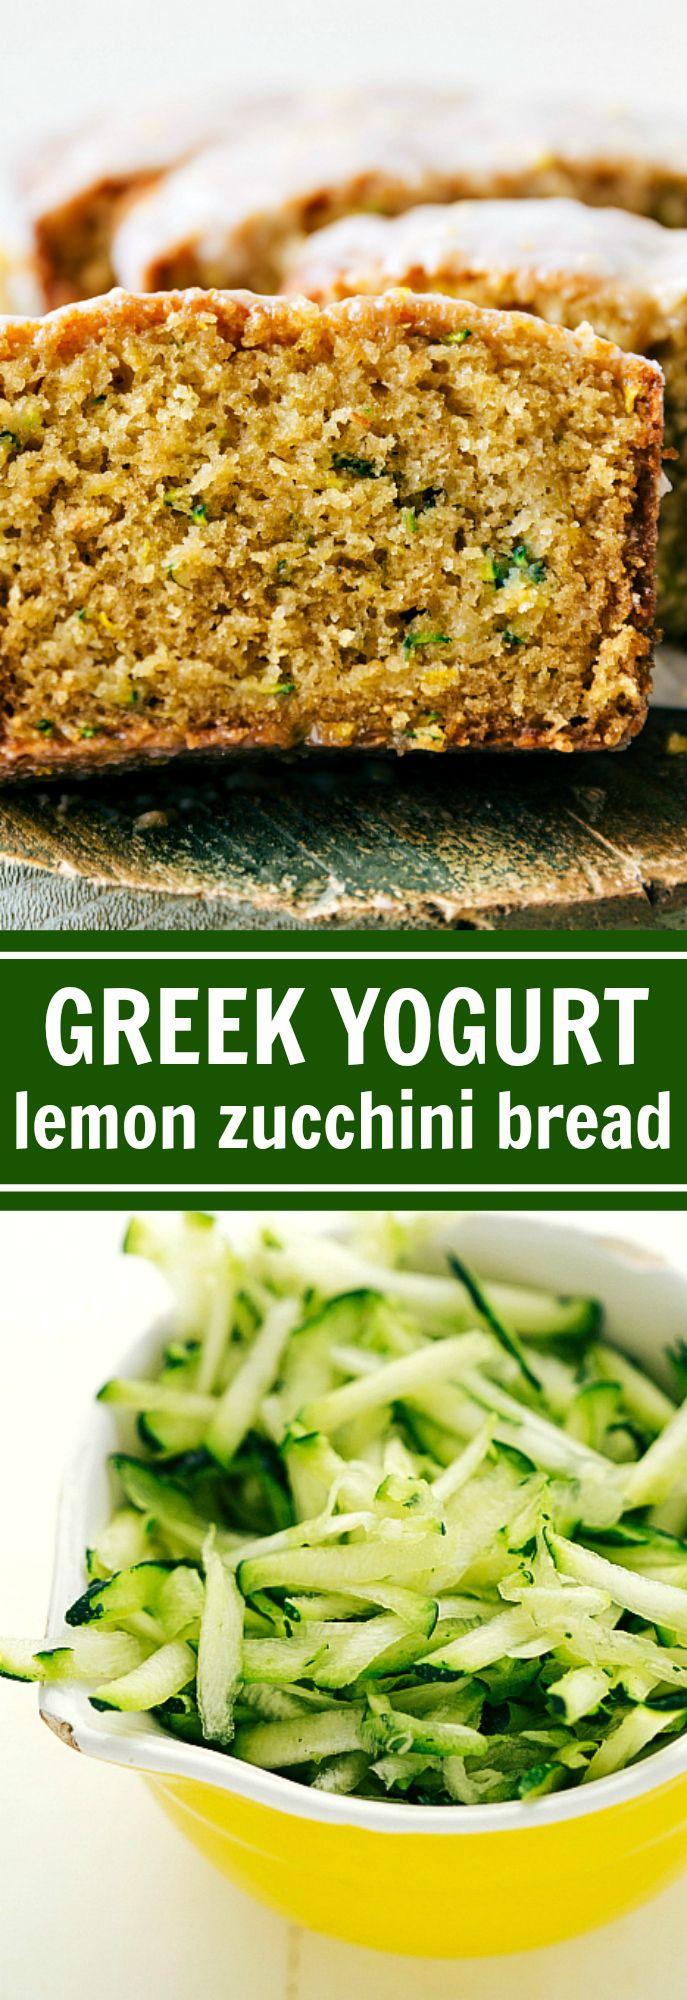 Healthier Lemon GREEK YOGURT Zucchini Bread. A delicious and healthier take on zucchini bread. This moist lemon zucchini bread has a slightly tart lemon flavor and a tangy lemon glaze. Recipe from chelseasmessyapron.com